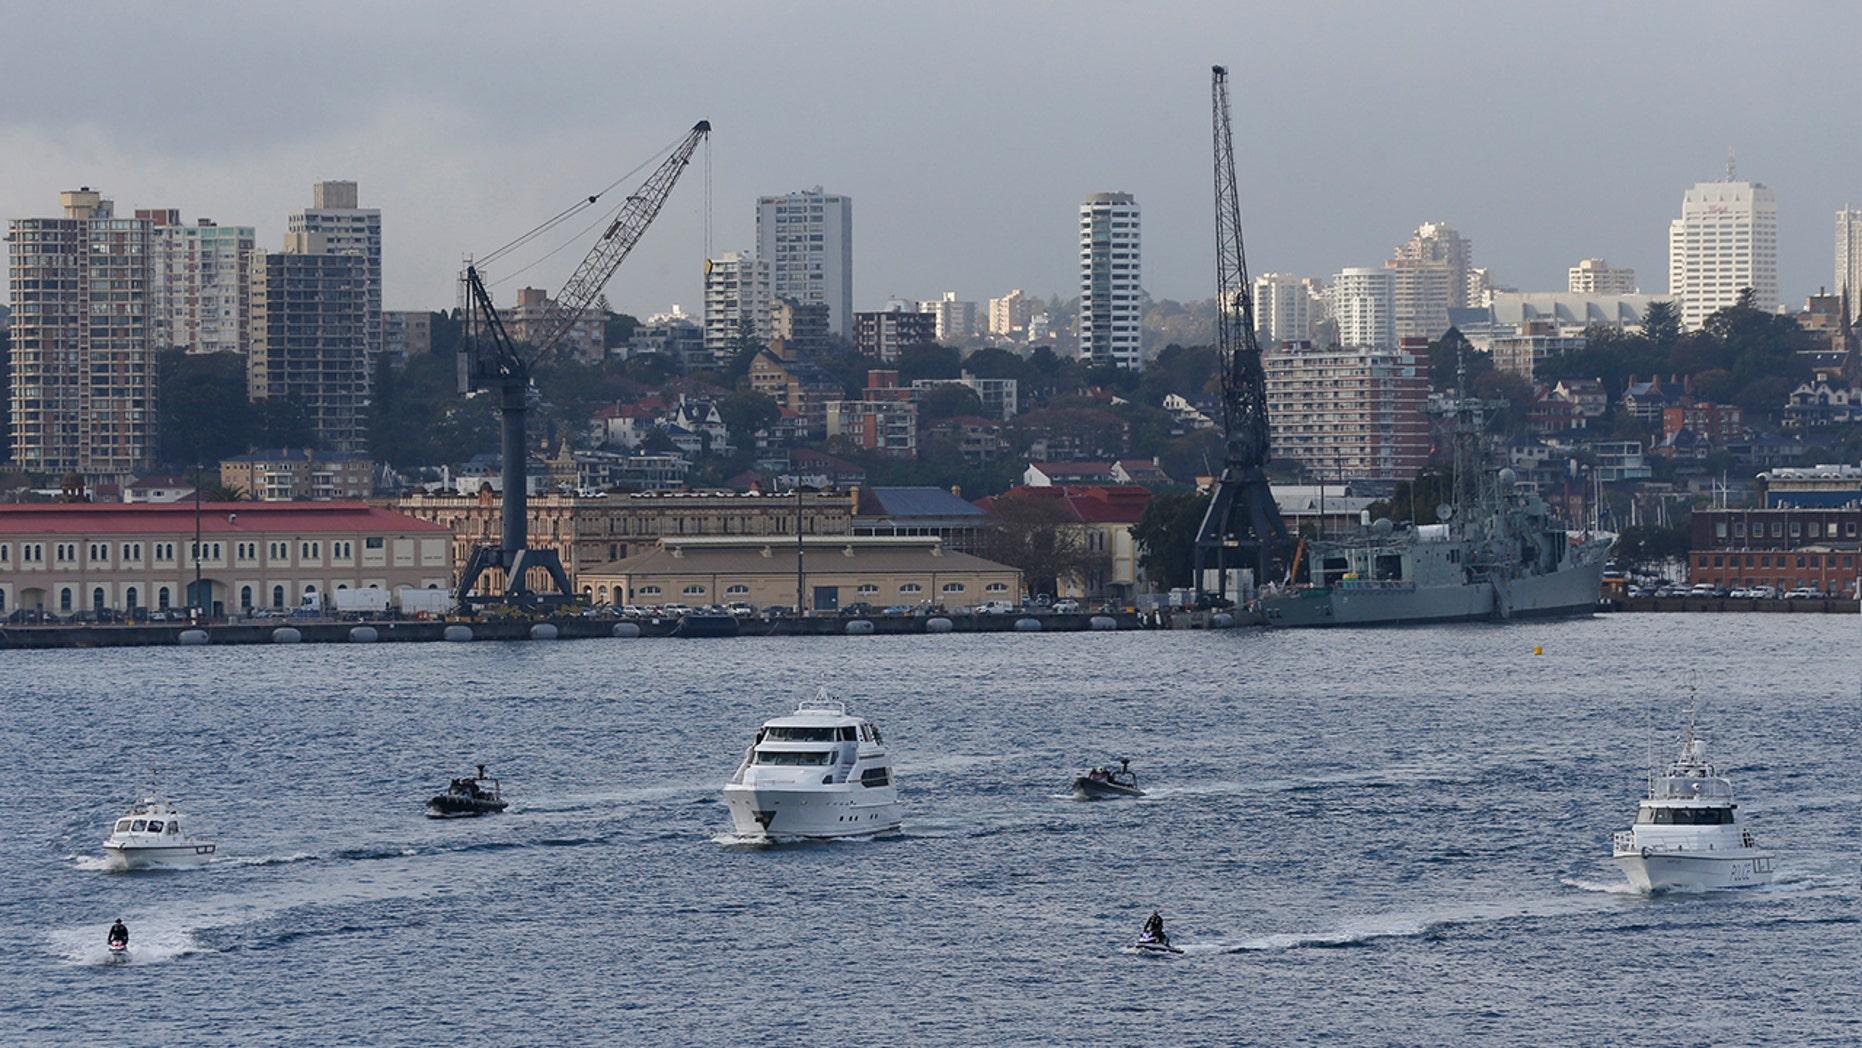 A flotilla including a motor launch crosses Sydney Harbor.